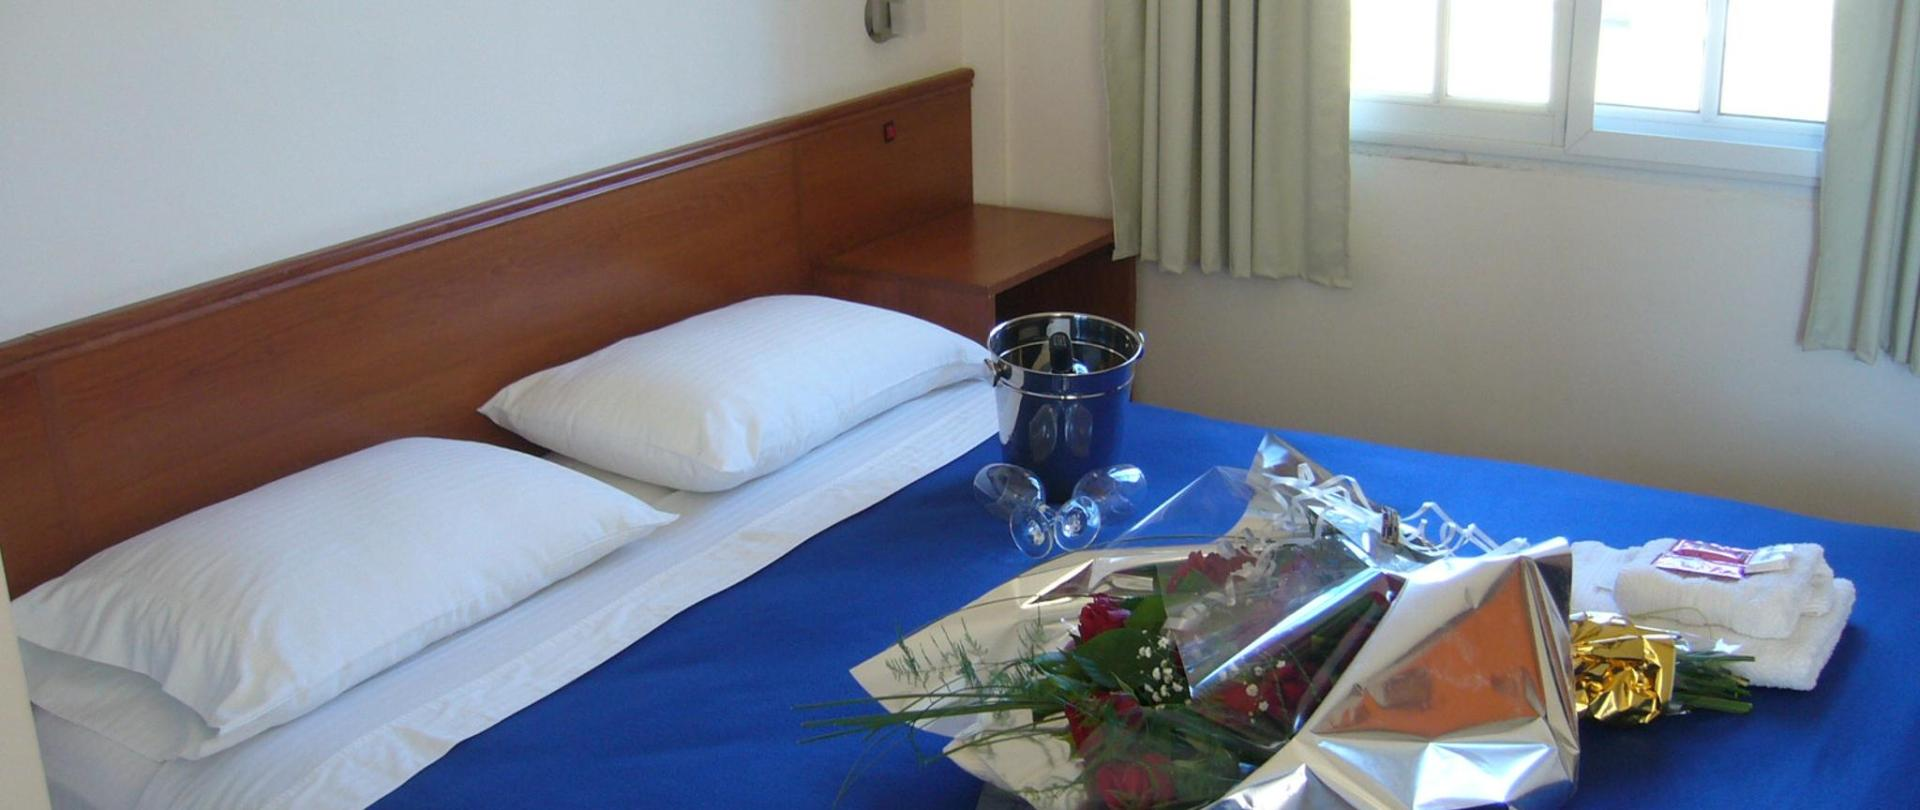 Habitación Doble Matrimonial - Luna de Miel.JPG